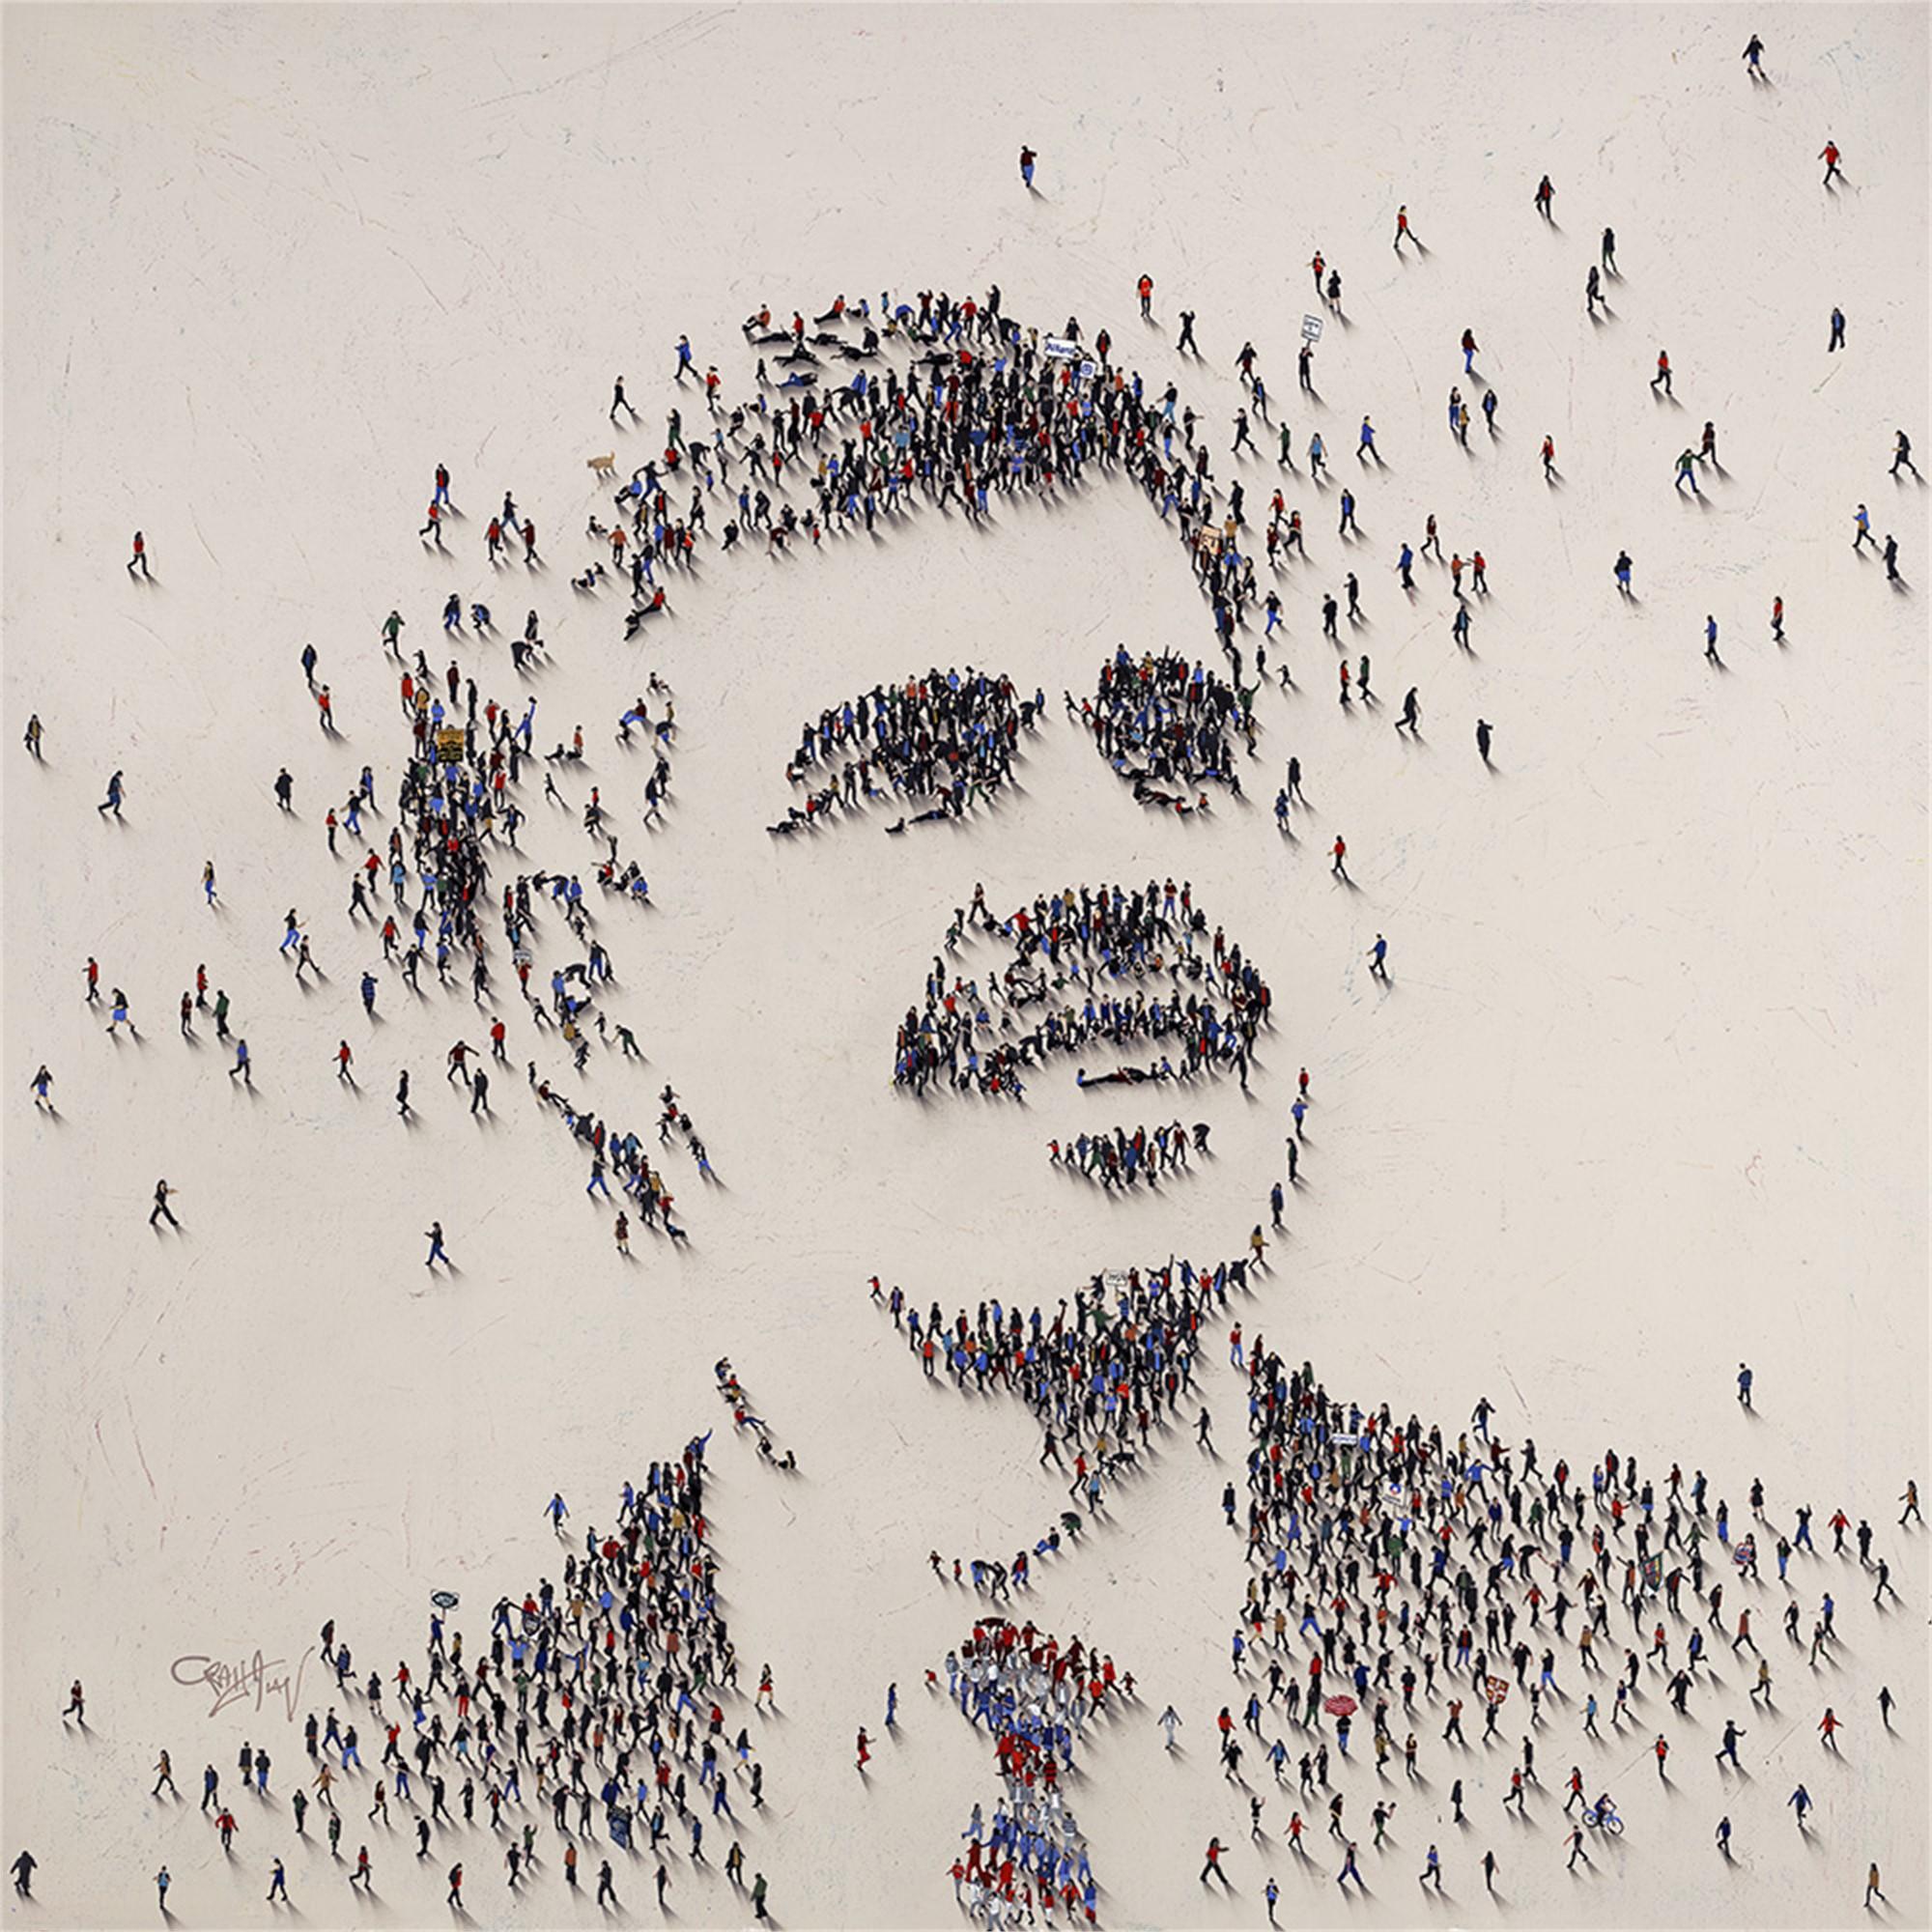 Mohamed A. El-Erian (SOLD) by Populus Commission Craig Alan